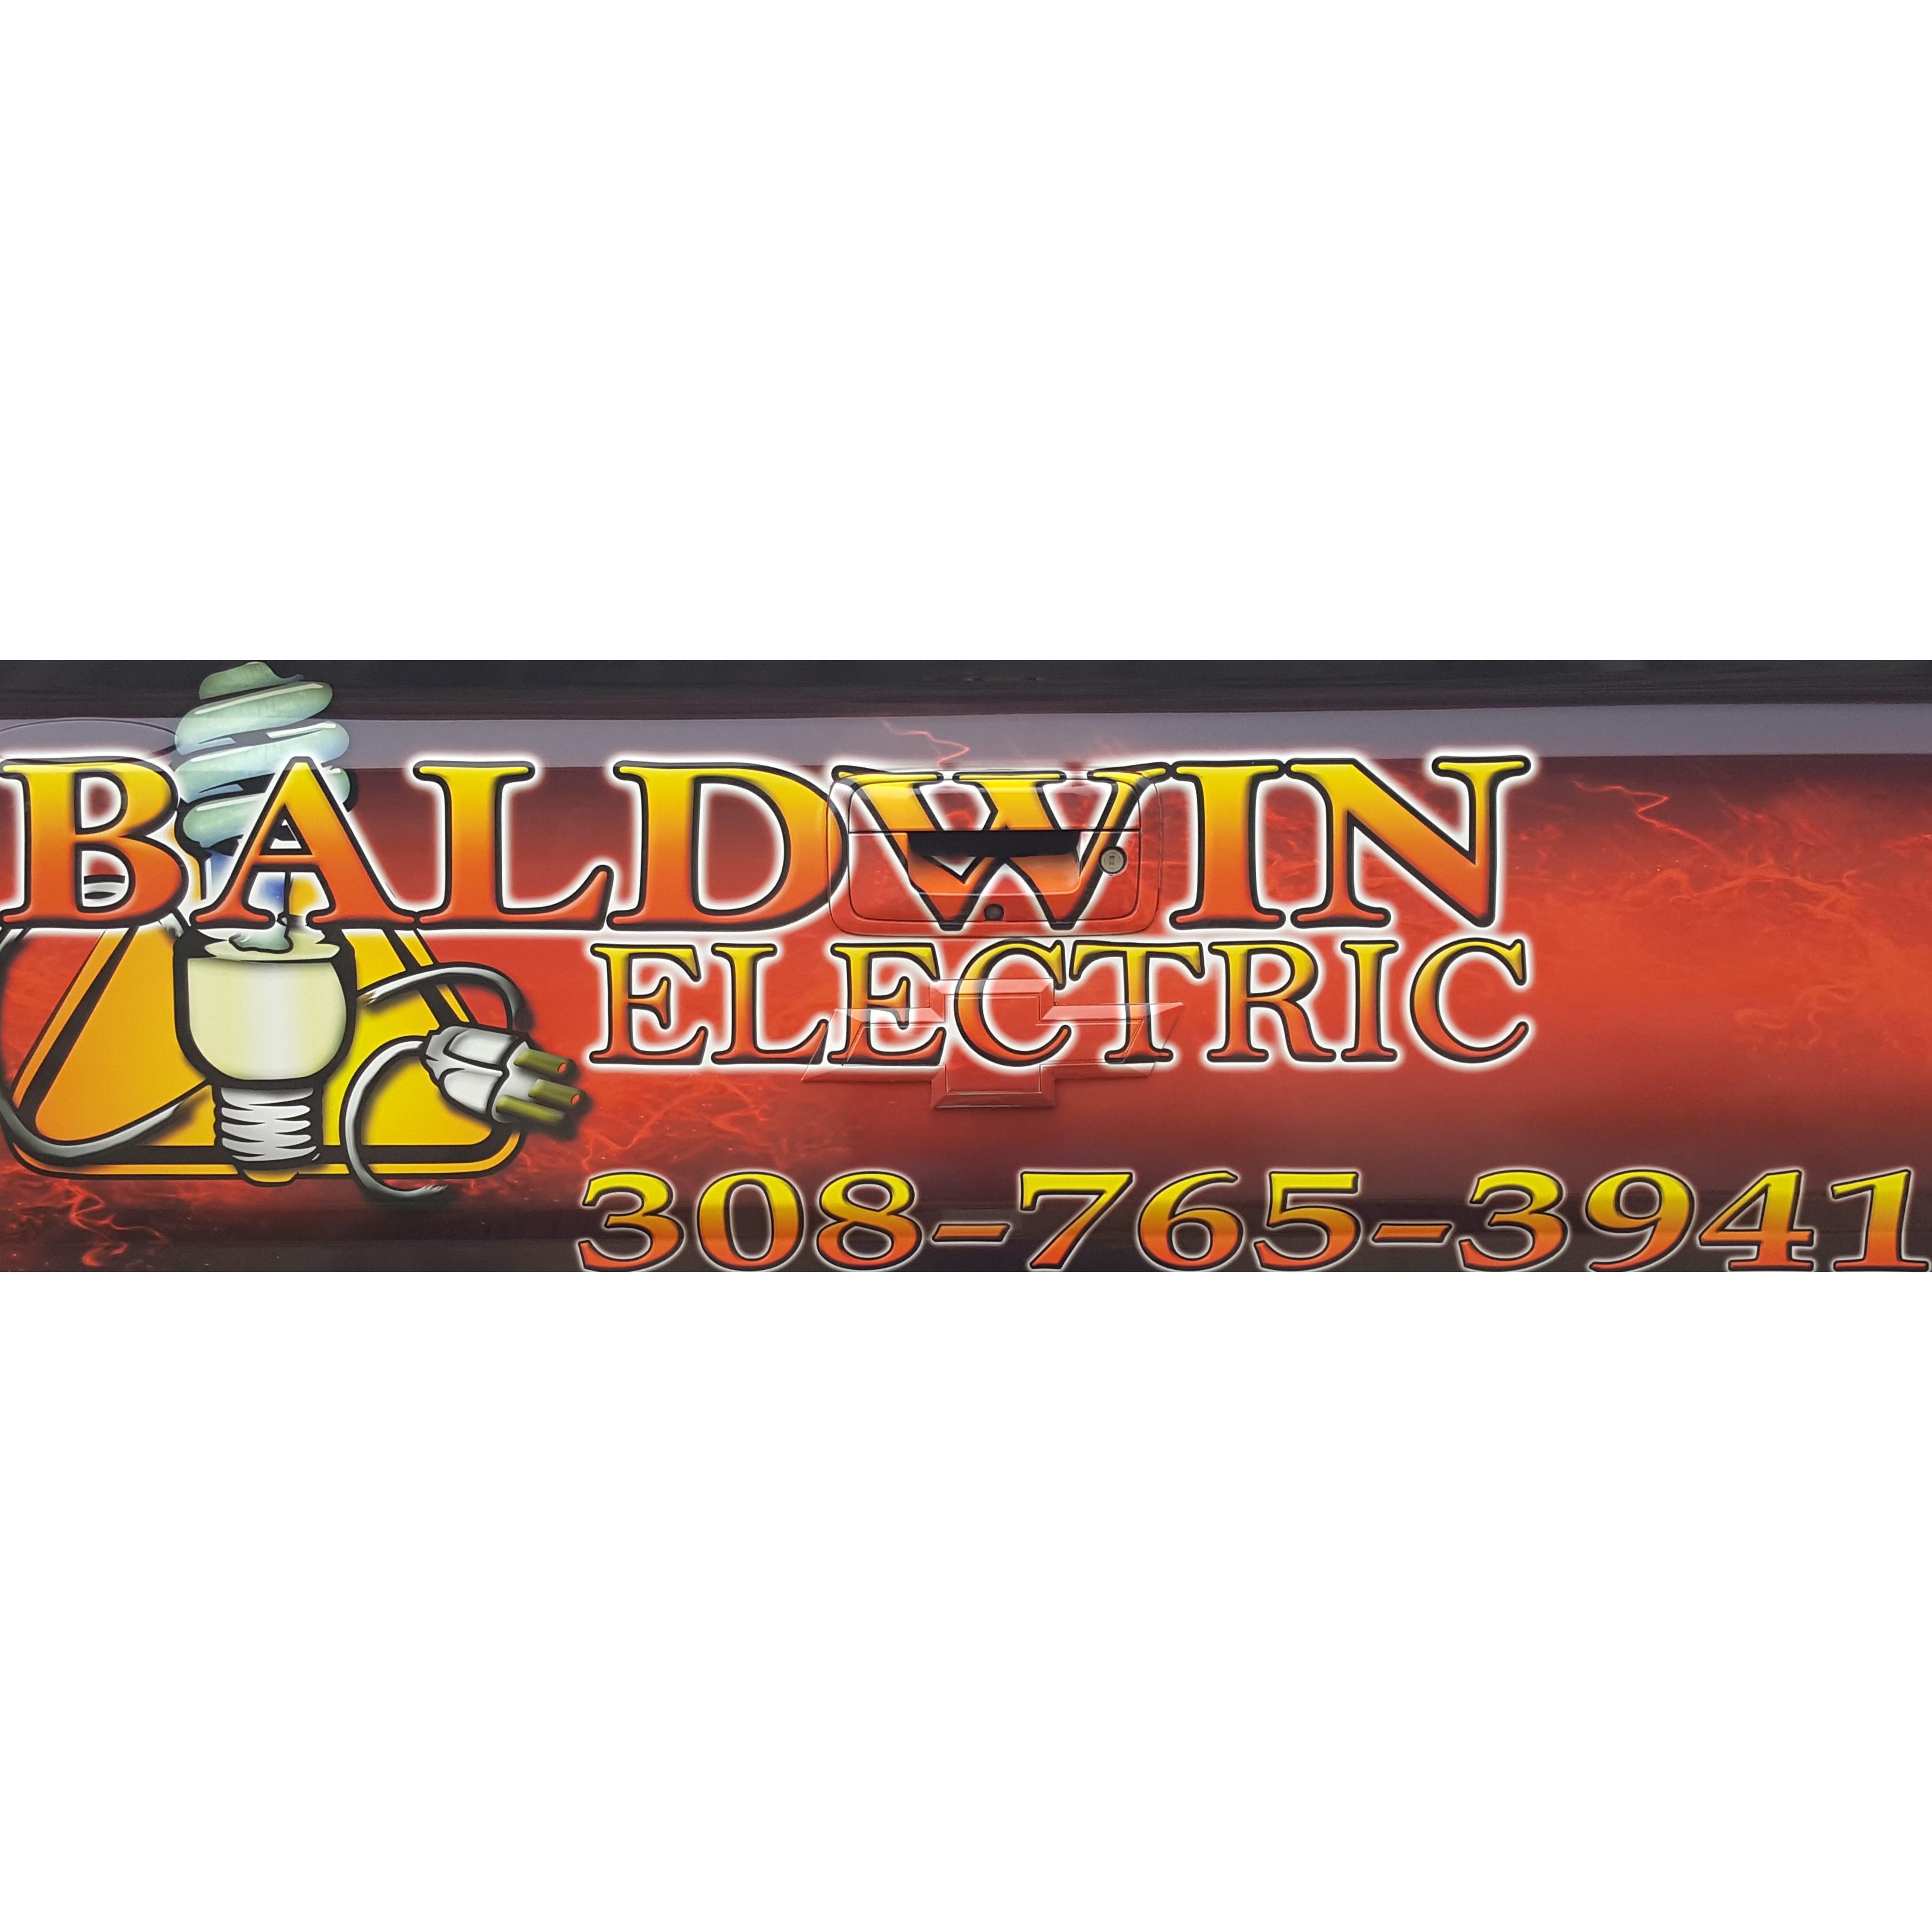 BALDWIN ELECTRIC LLC